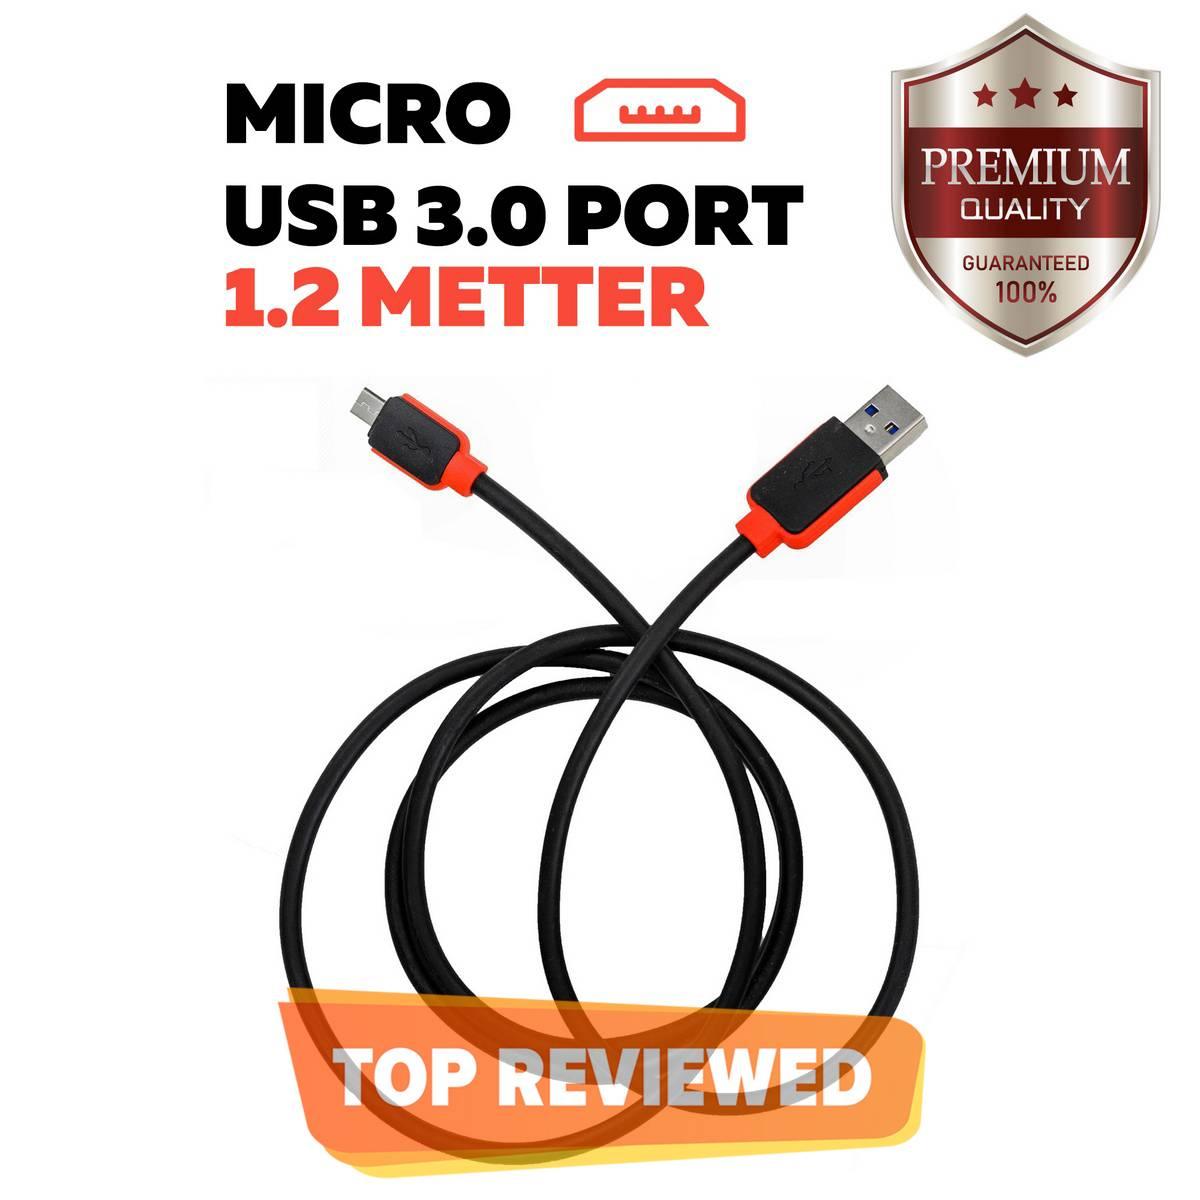 ORIGINAL Warner Data Cable 1.2 Meter Micro USB 3.0 Fast Charging  For Android Phones